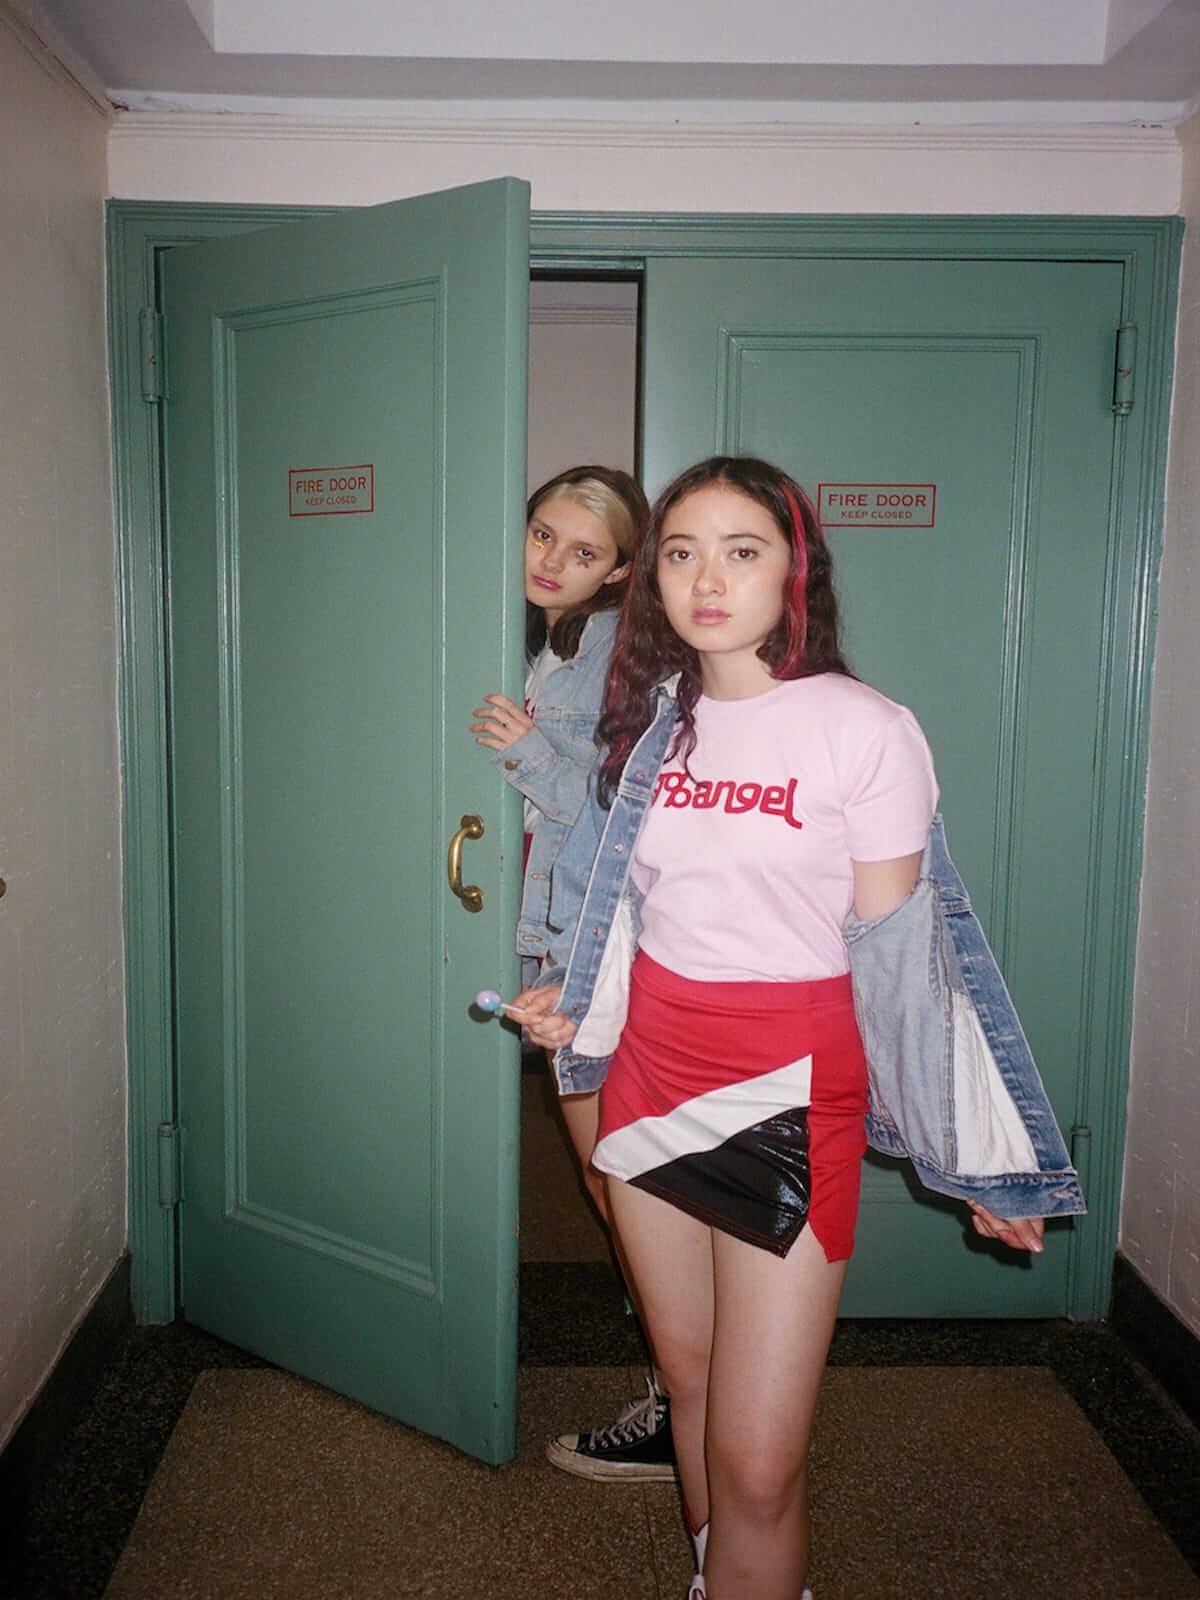 X-girl×ヴァナ・ヤングスタイン ガーリーなオリジナルプリントの入った初コラボTシャツが登場! lifefashion180619_X-girl_onitsuka_03-1200x1600